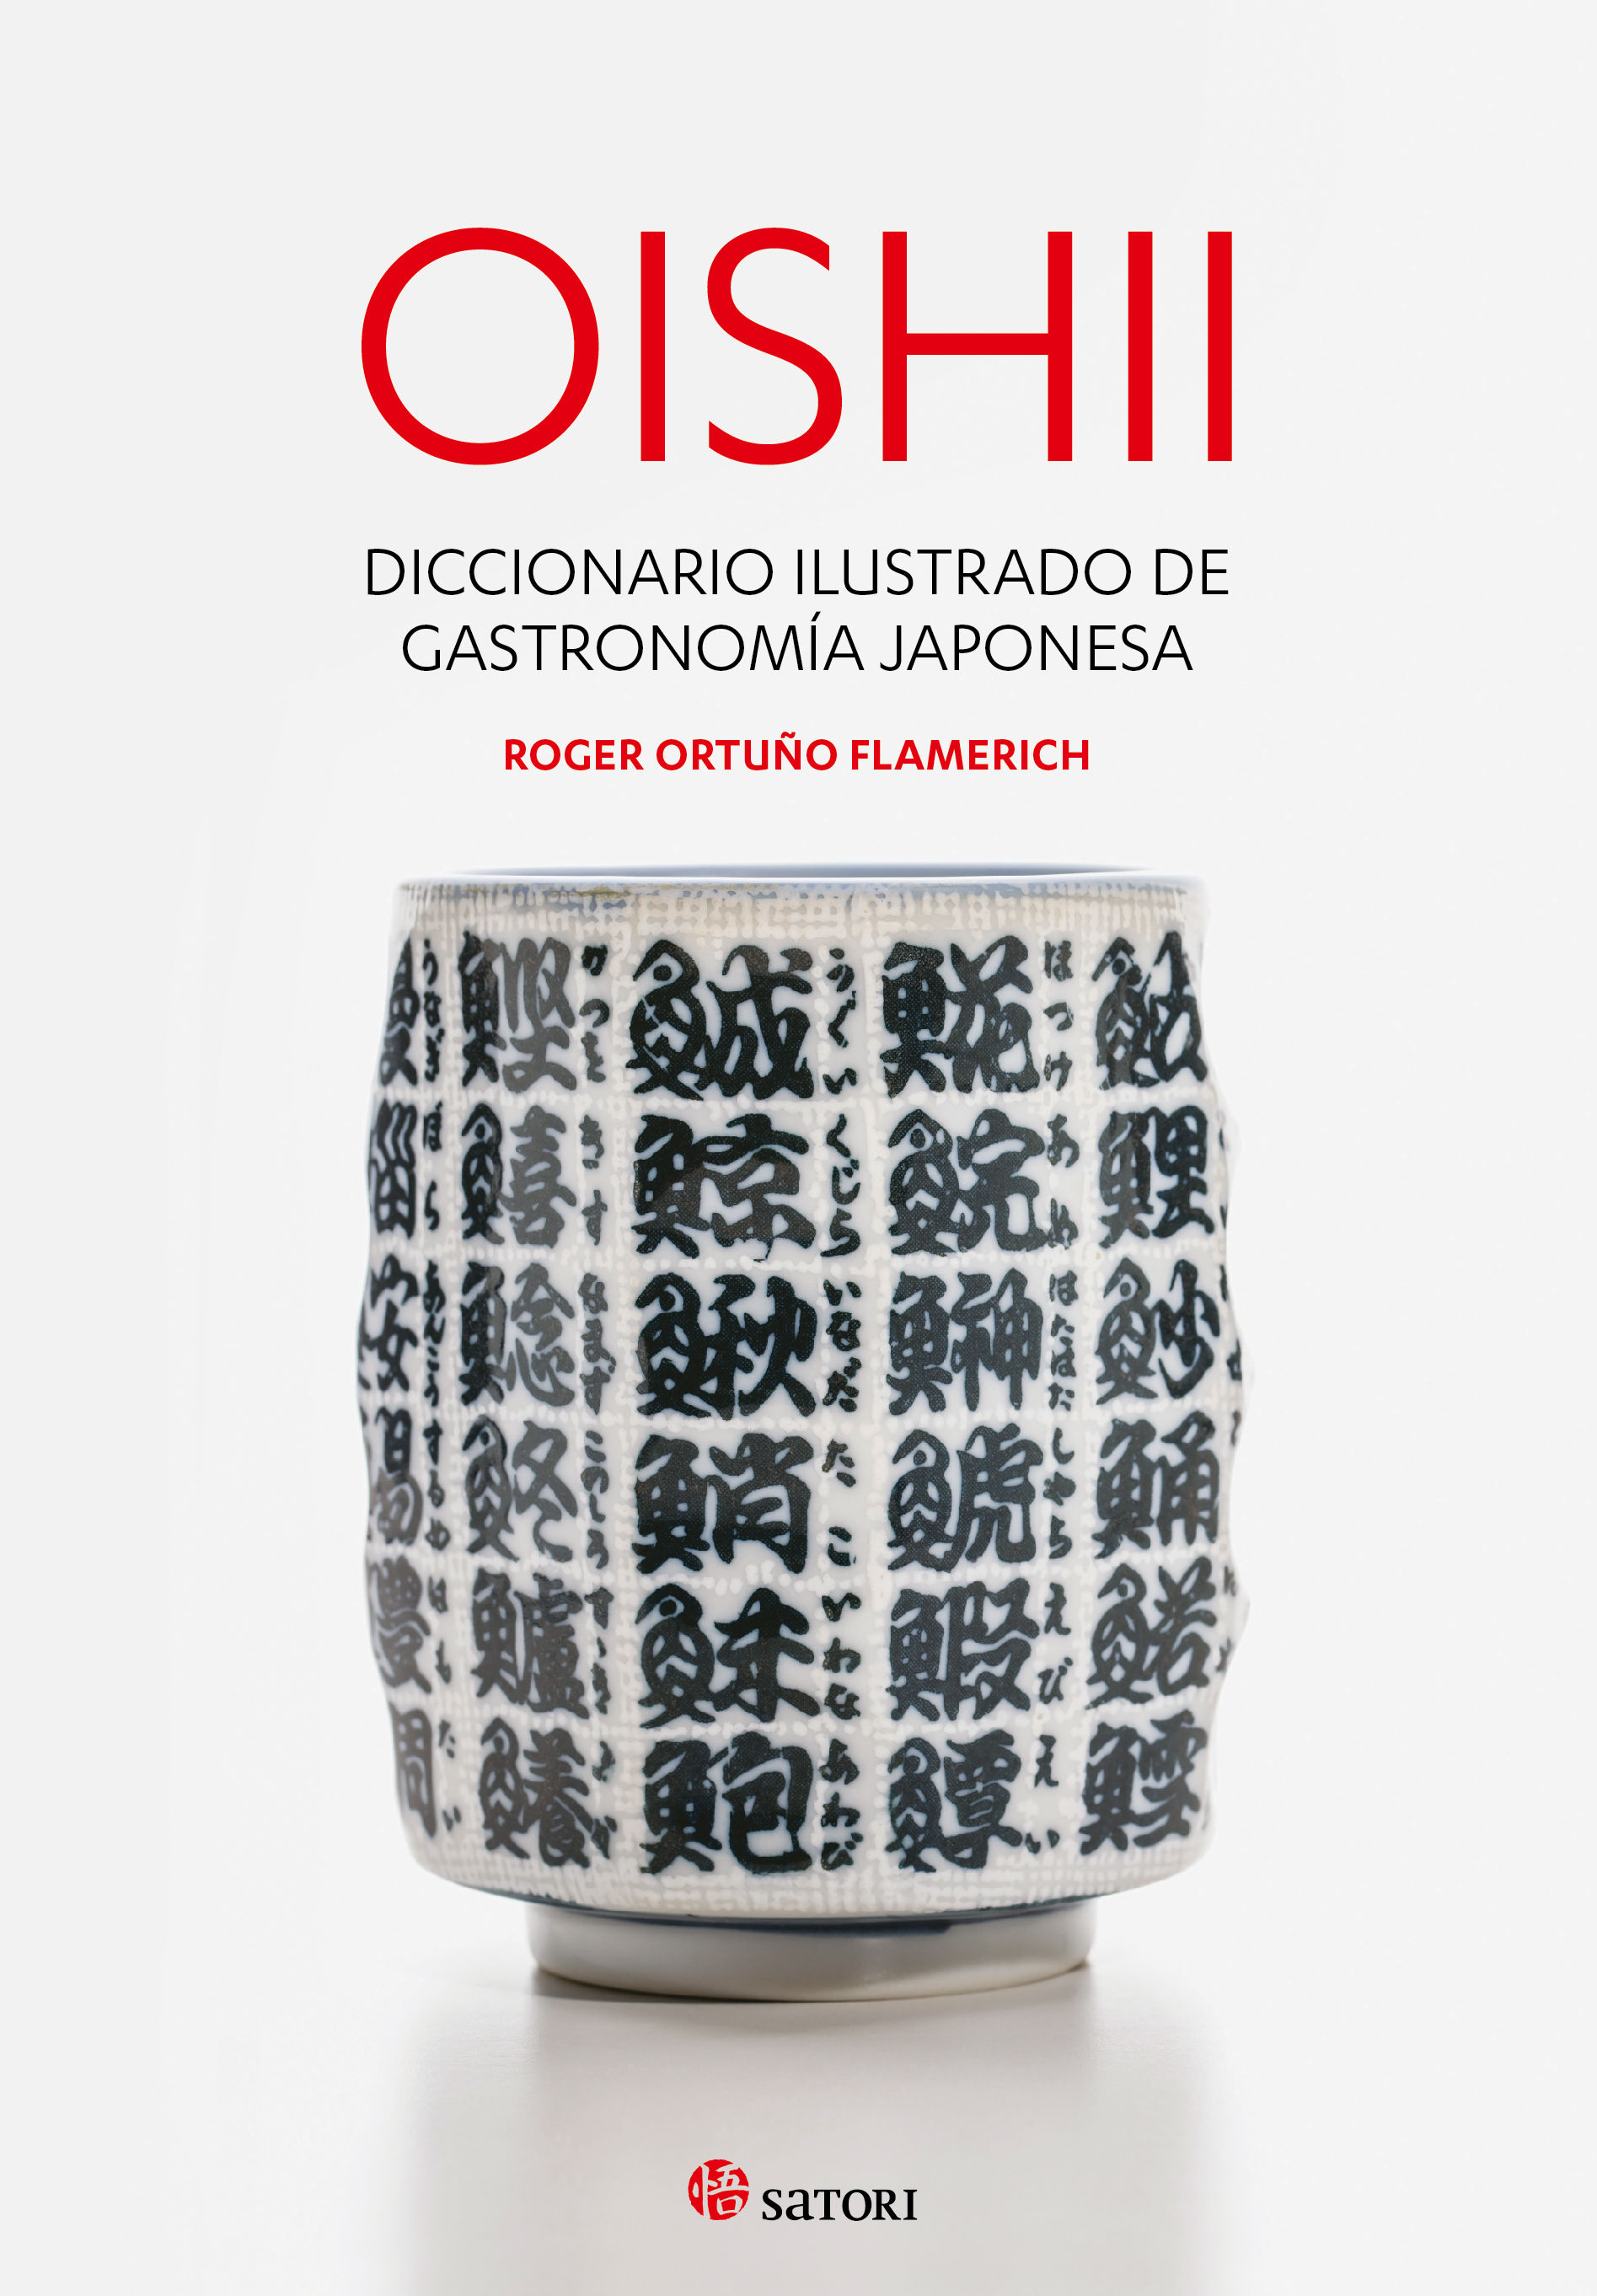 OISHII DICCIONARIO ILUSTRADO DE GASTRONOMIA JAPONESA